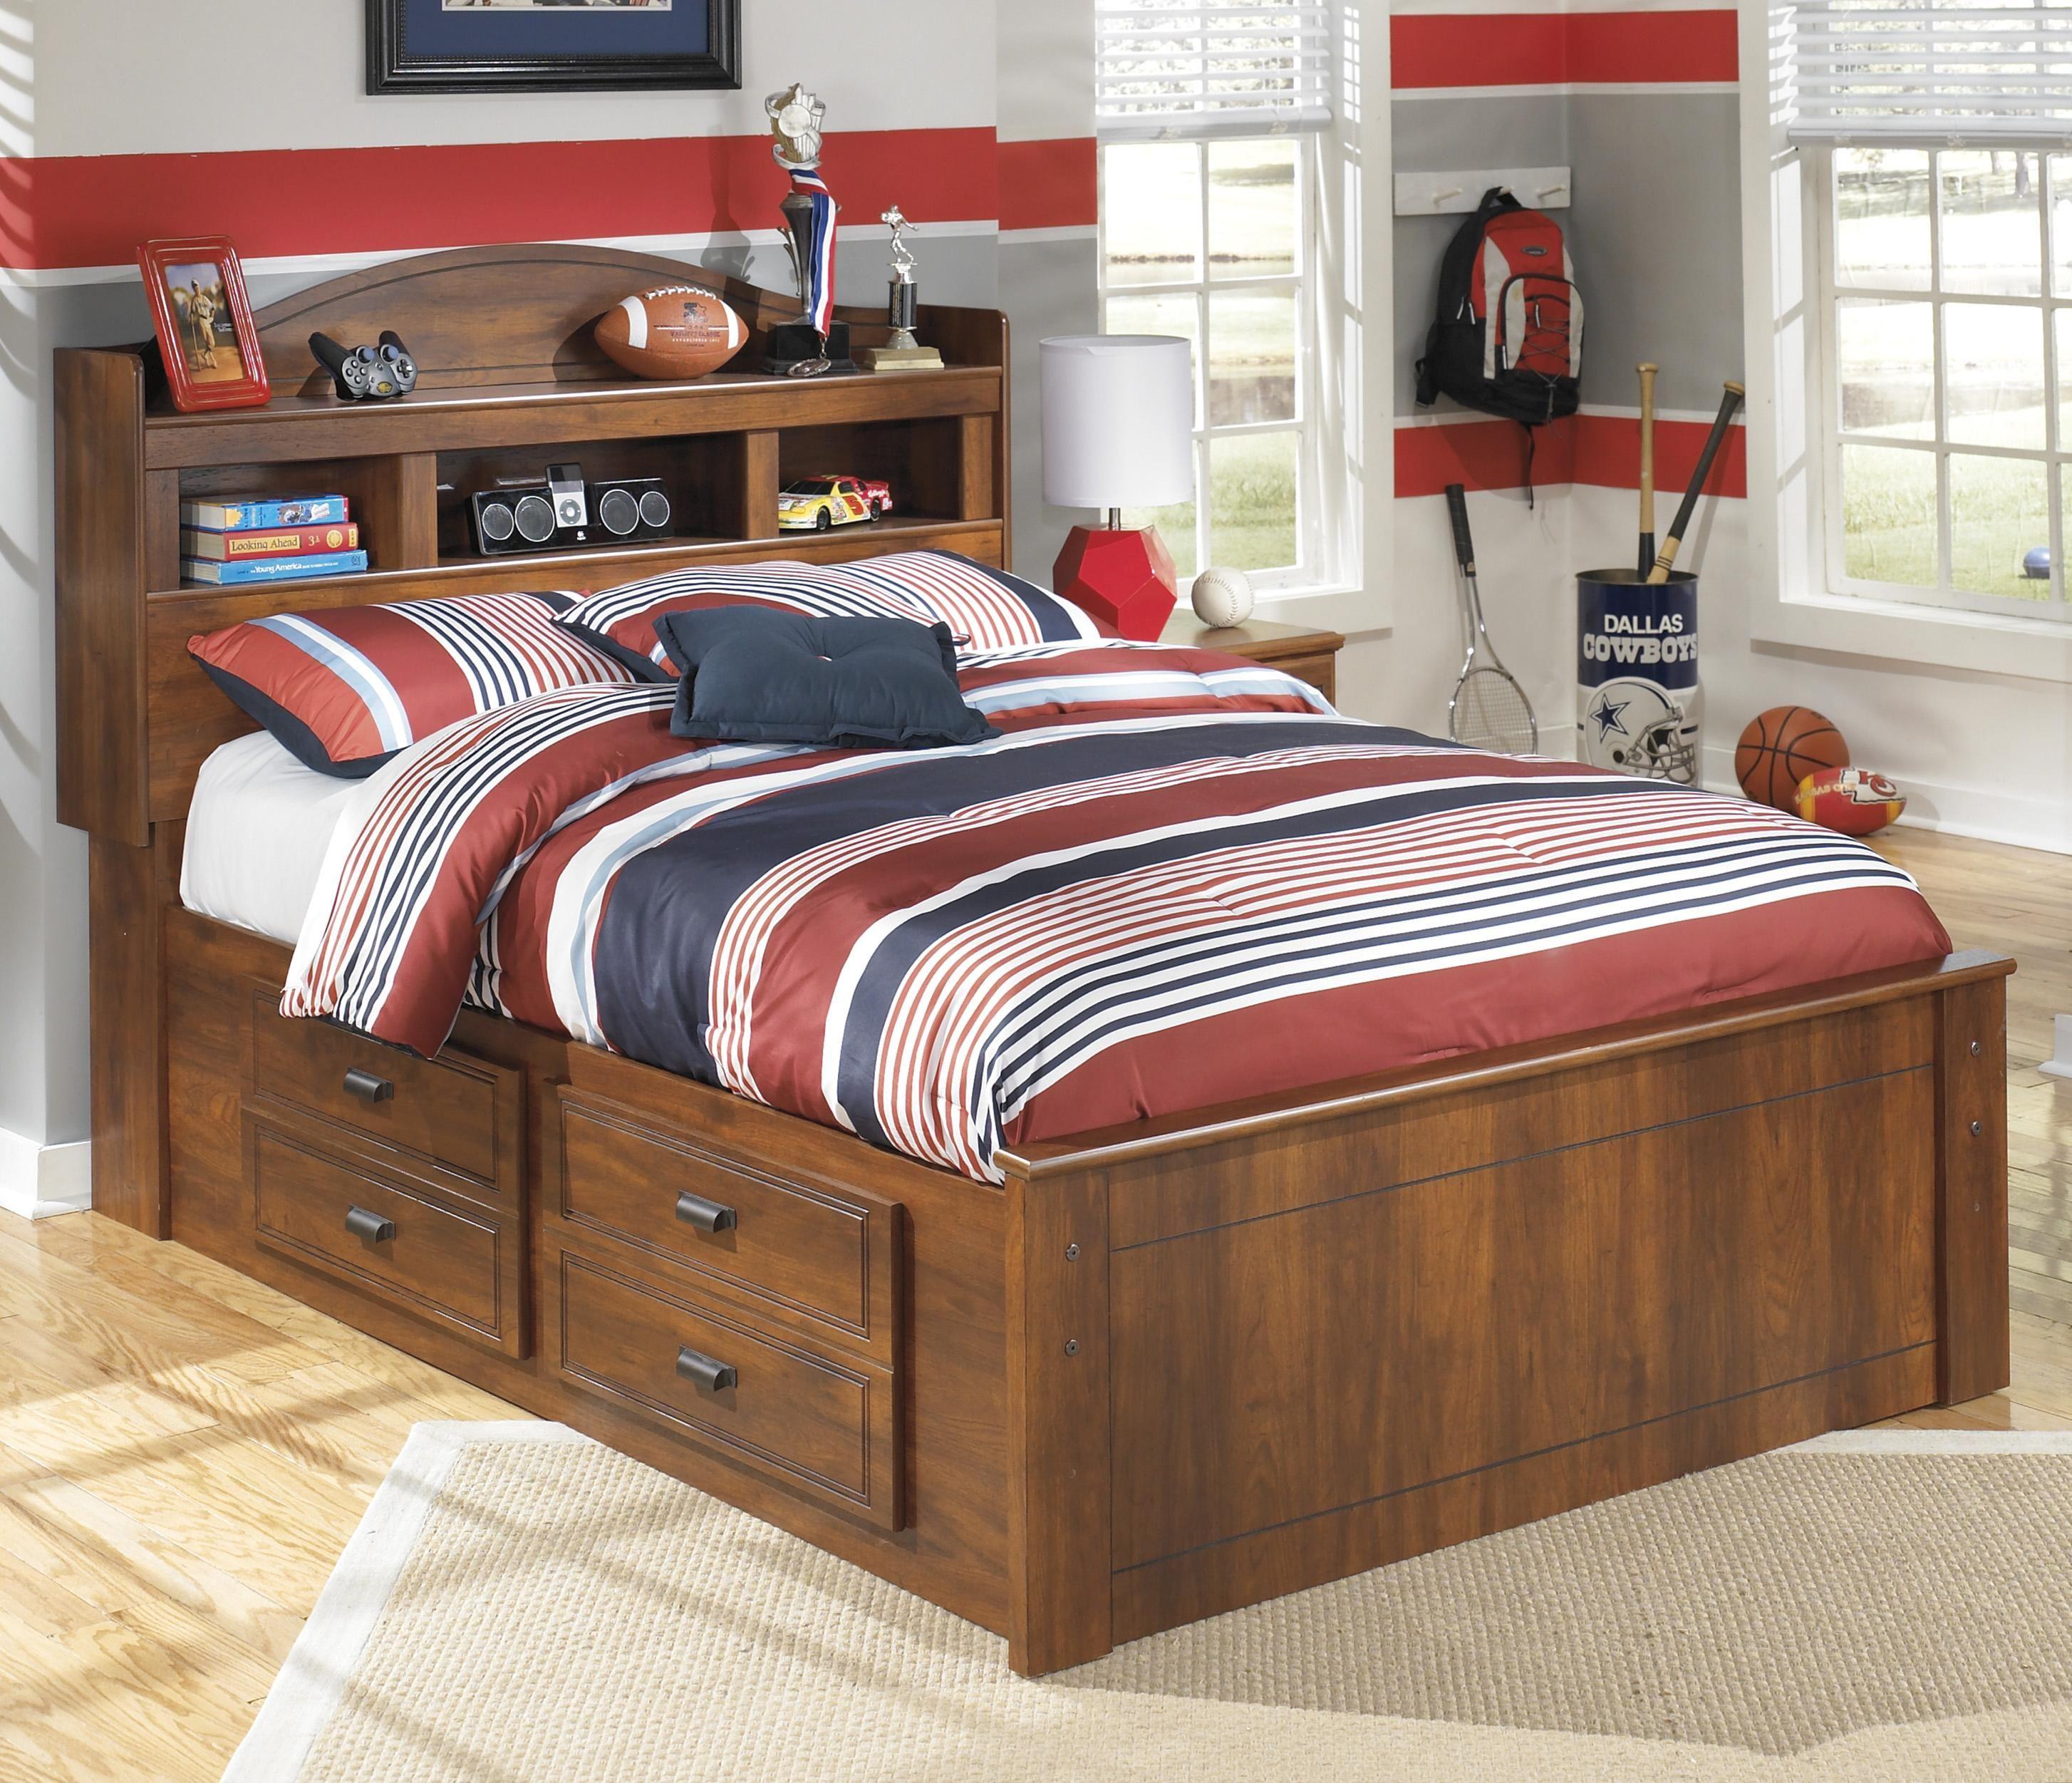 timber whitewash suites single fantastic with bed drawers king storage kids bedroom modern suite